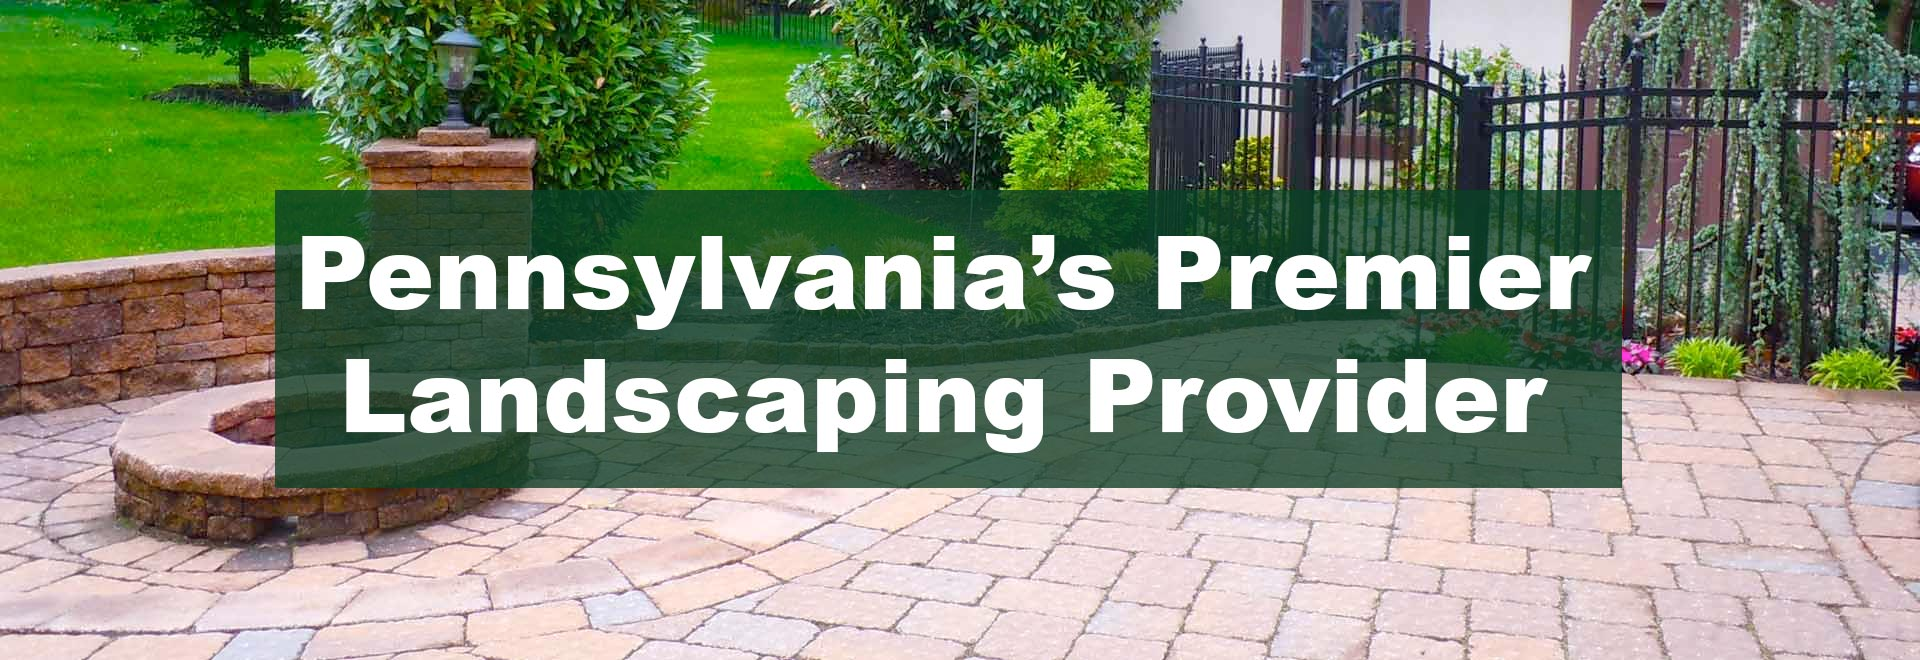 Anastasi Landscaping - Pennsylvania's Premier Landscaping Provider